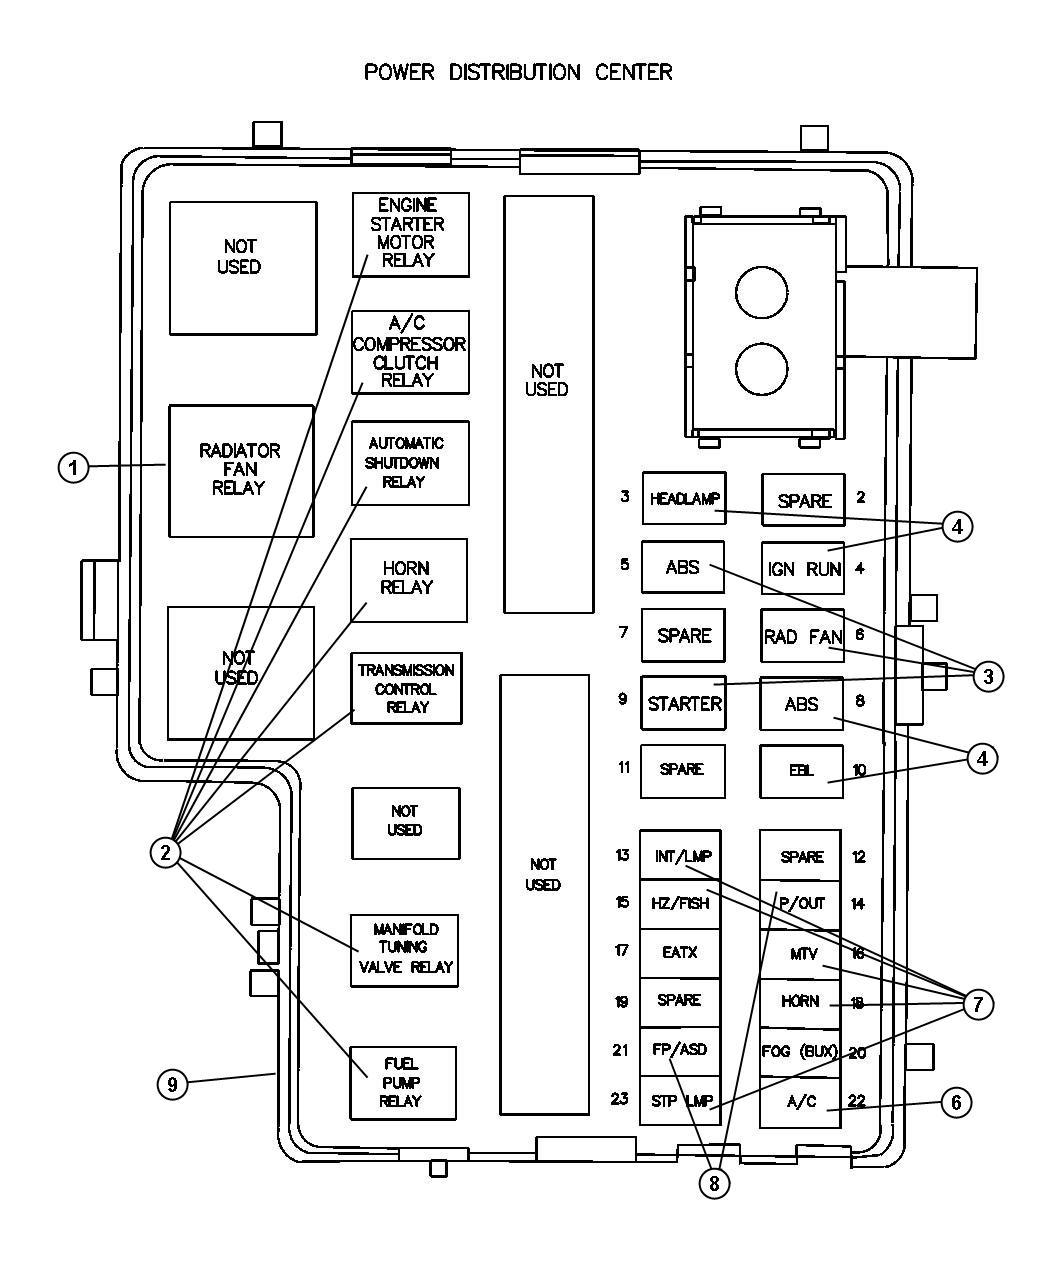 Dodge Neon Power Distribution Center